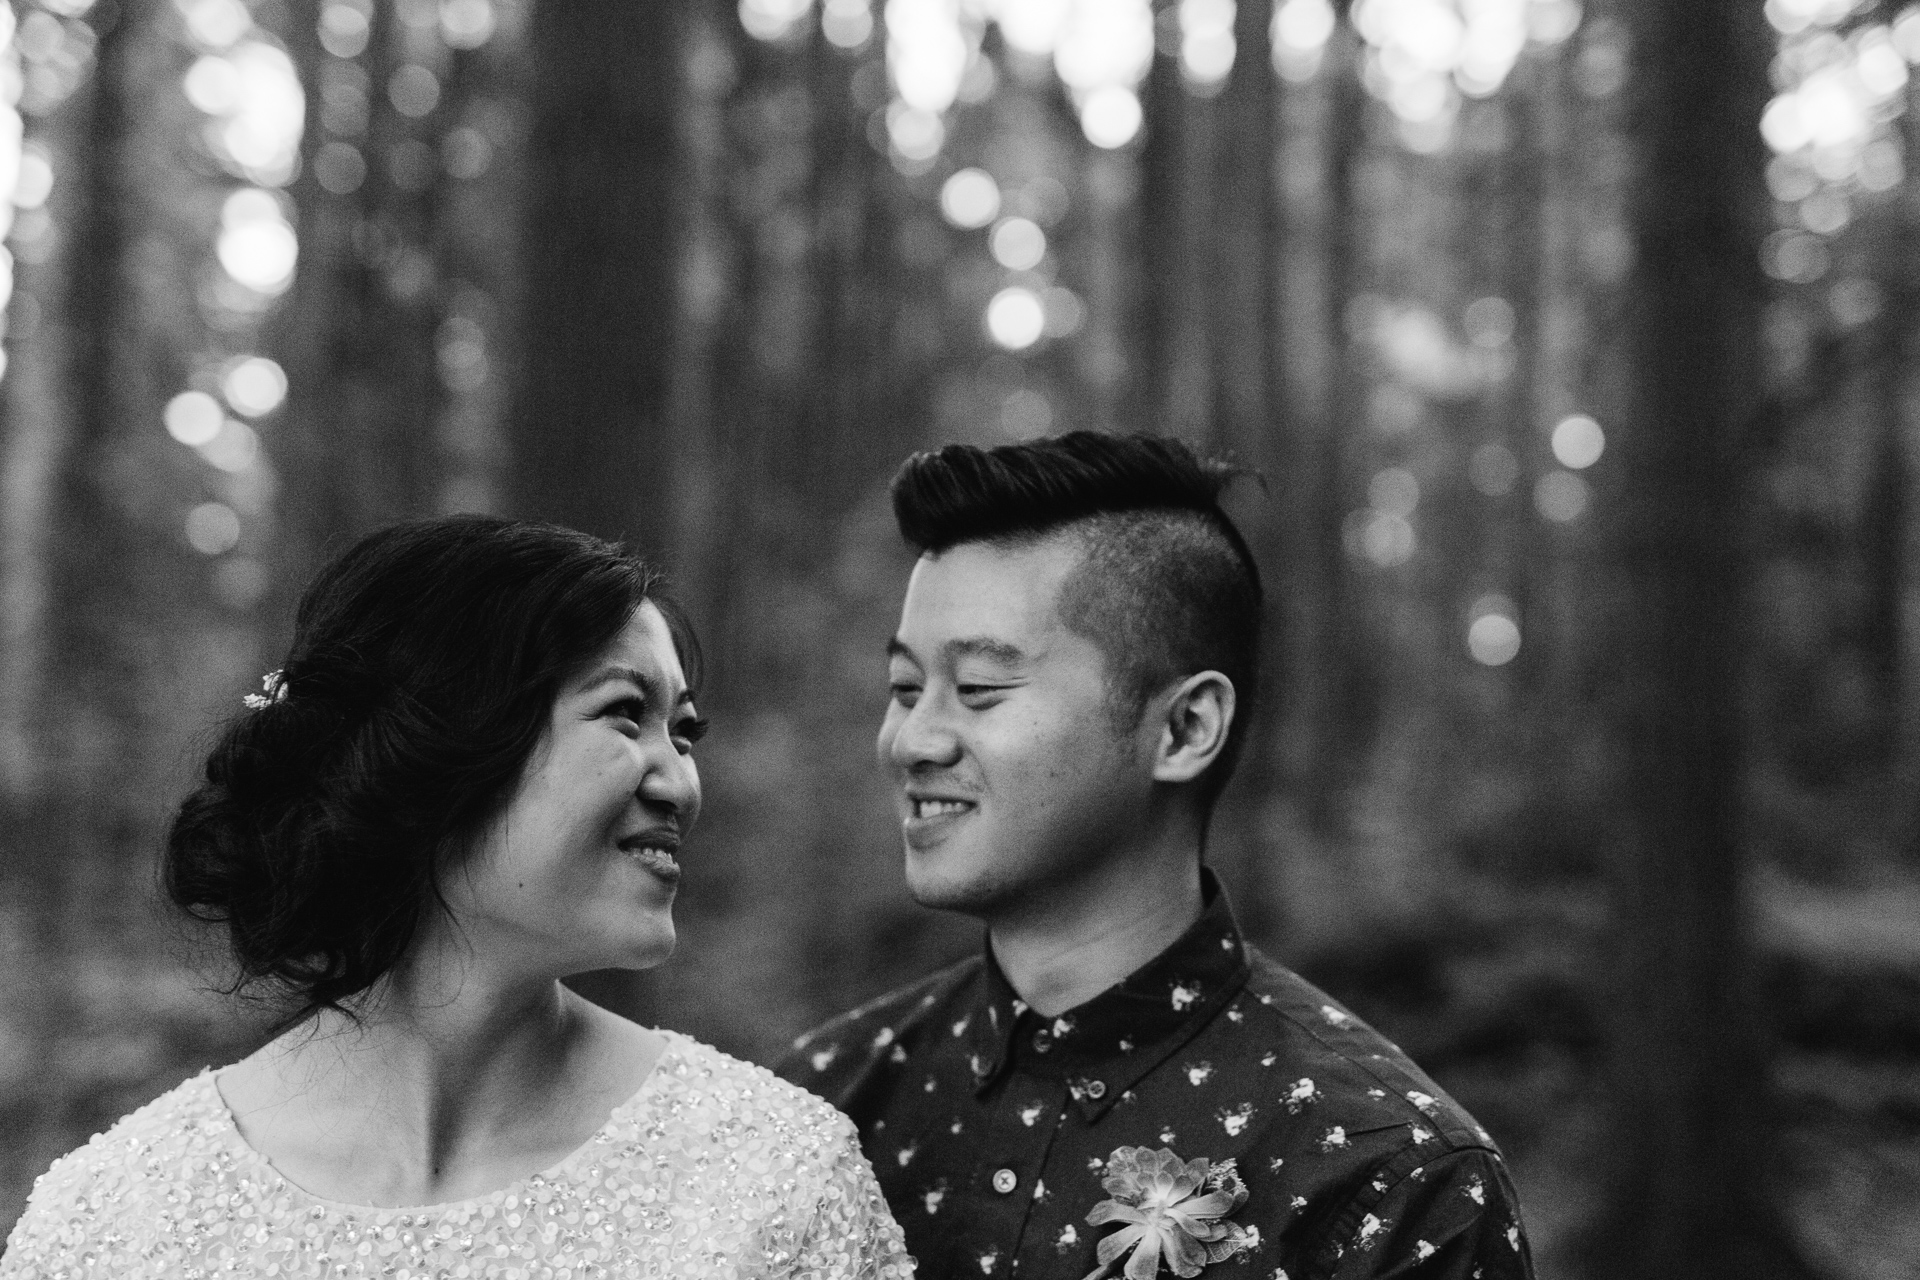 jess-hunter-seattle-artistic-wedding-photographer-6028.jpg